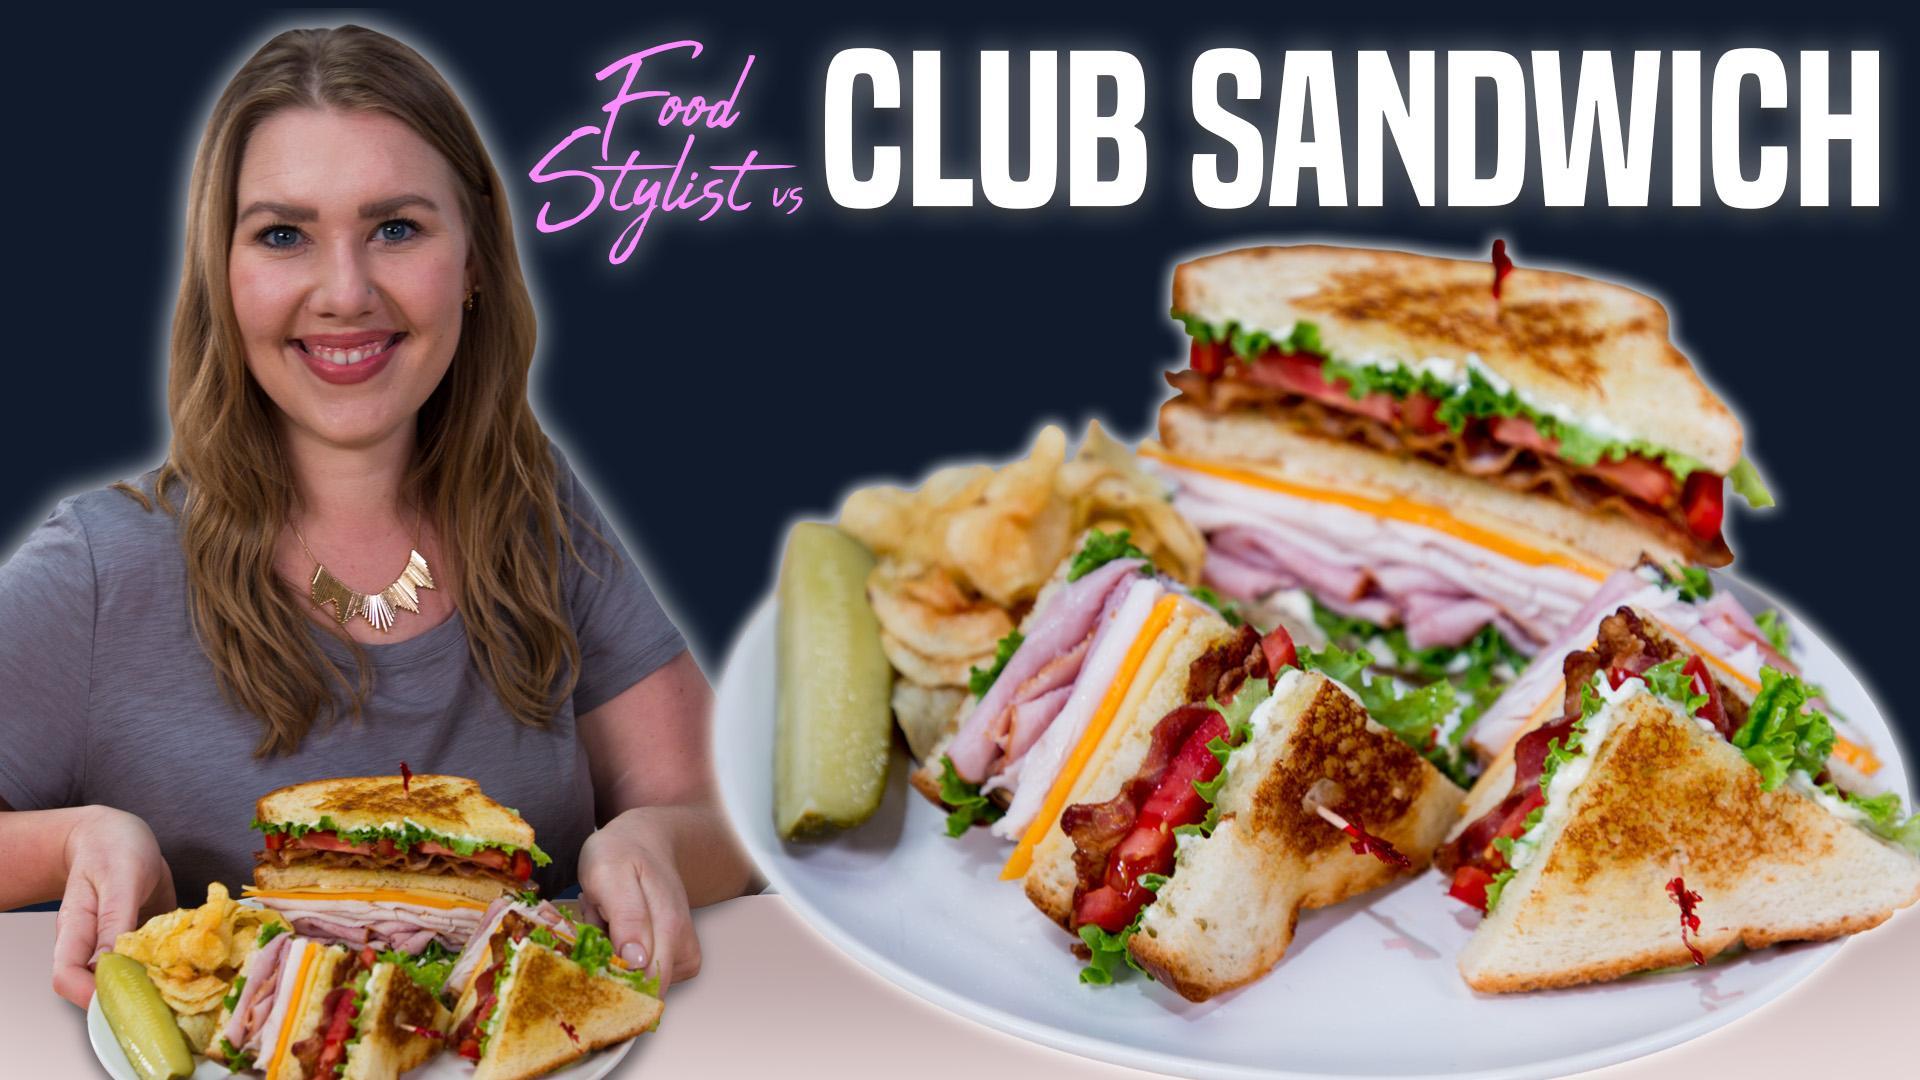 Food Stylist Vs Club Sandwich